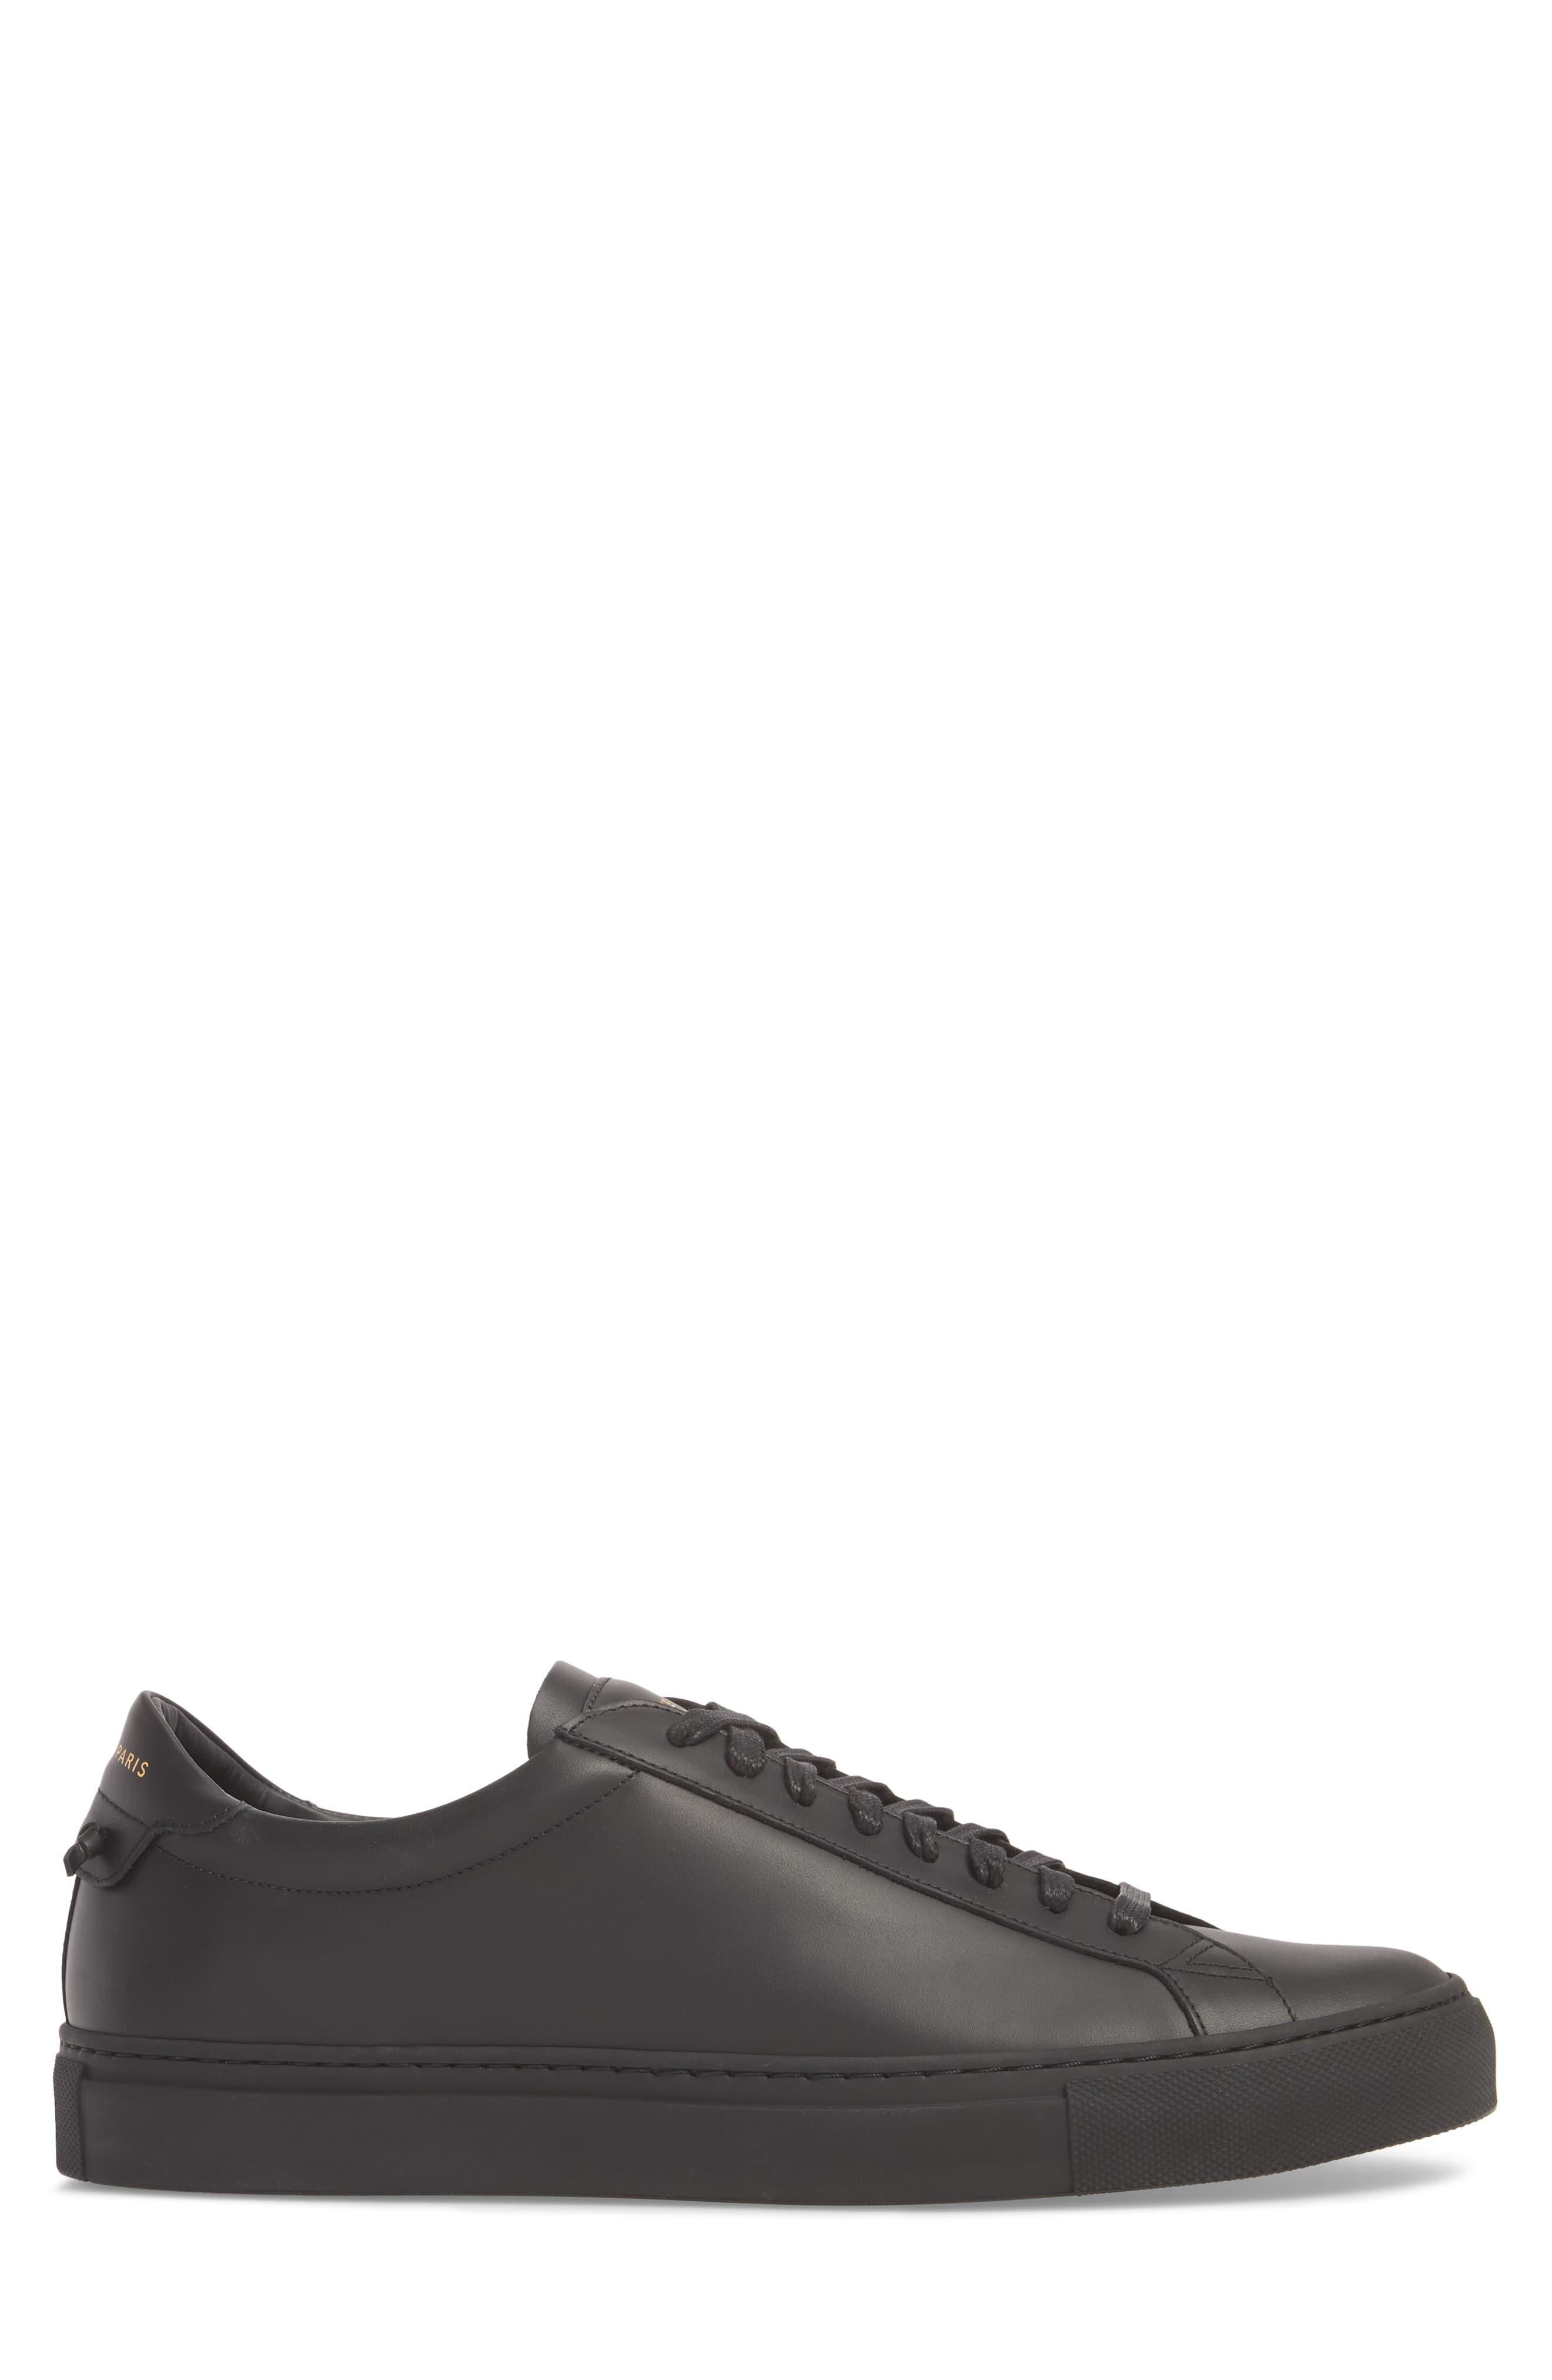 'Urban Knots Lo' Sneaker,                             Alternate thumbnail 3, color,                             Black